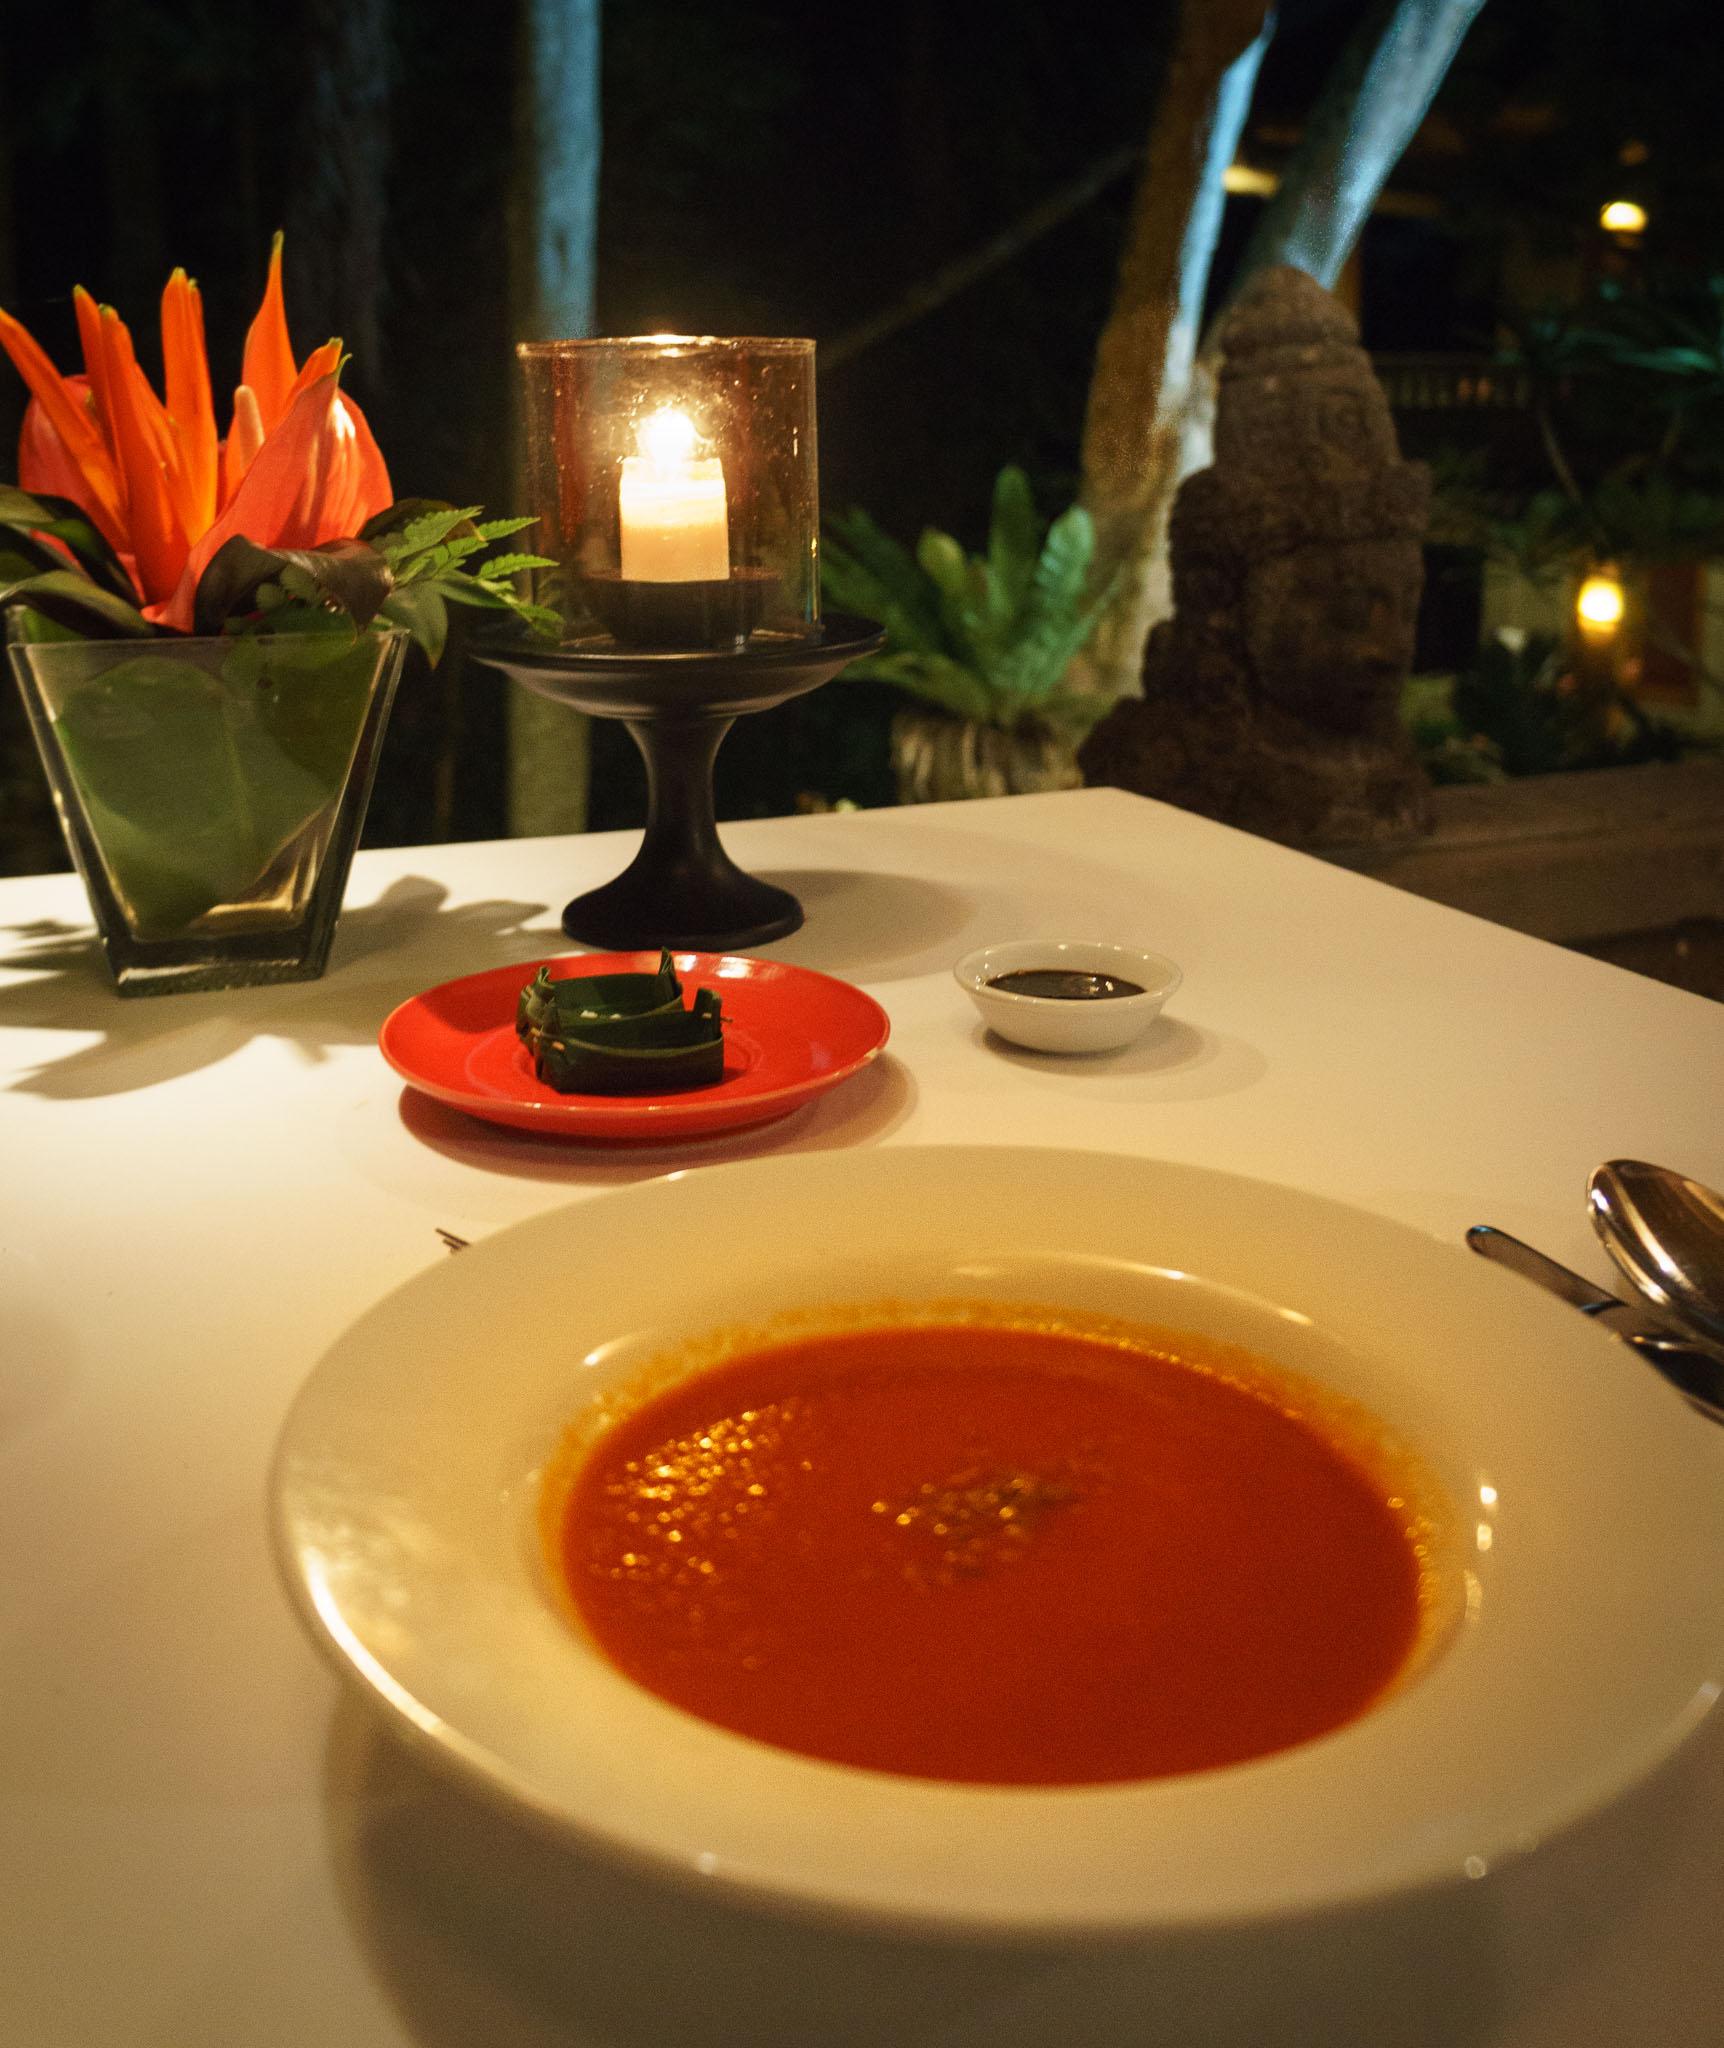 Dinner Soup One World Retreats Ubud Bali